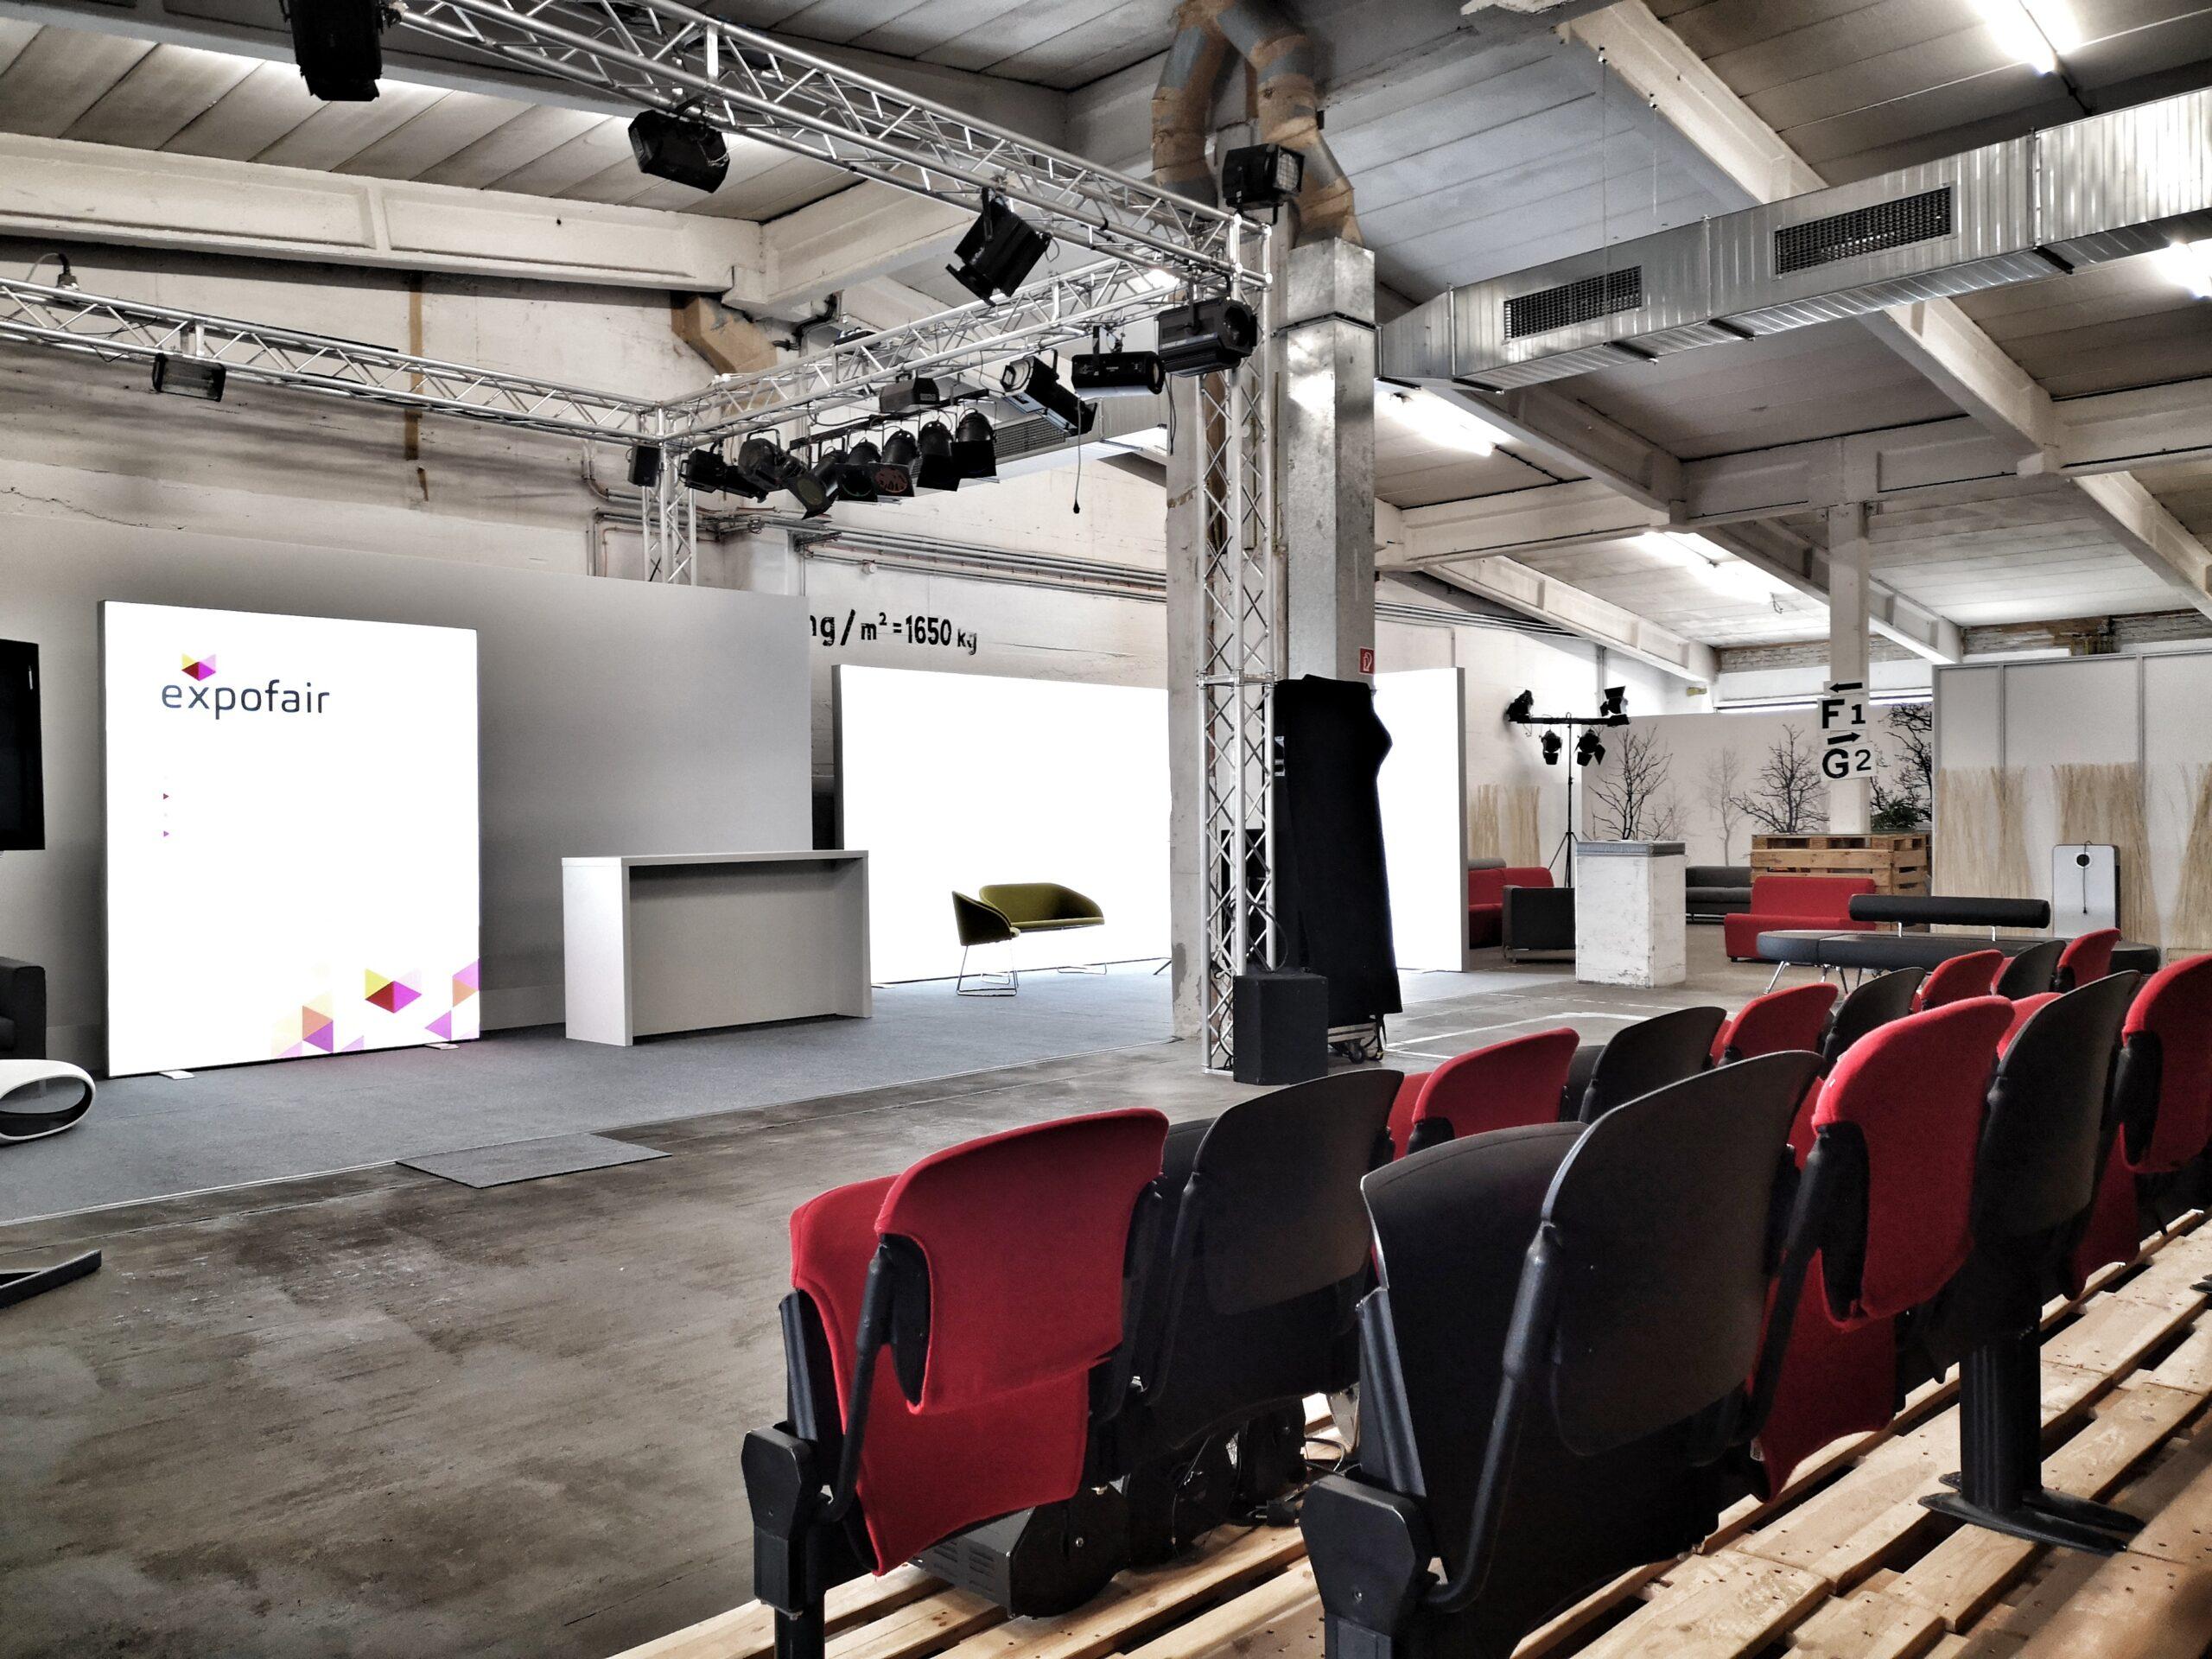 Digitales Studio Berlin mit Kinobestuhlung - expofair